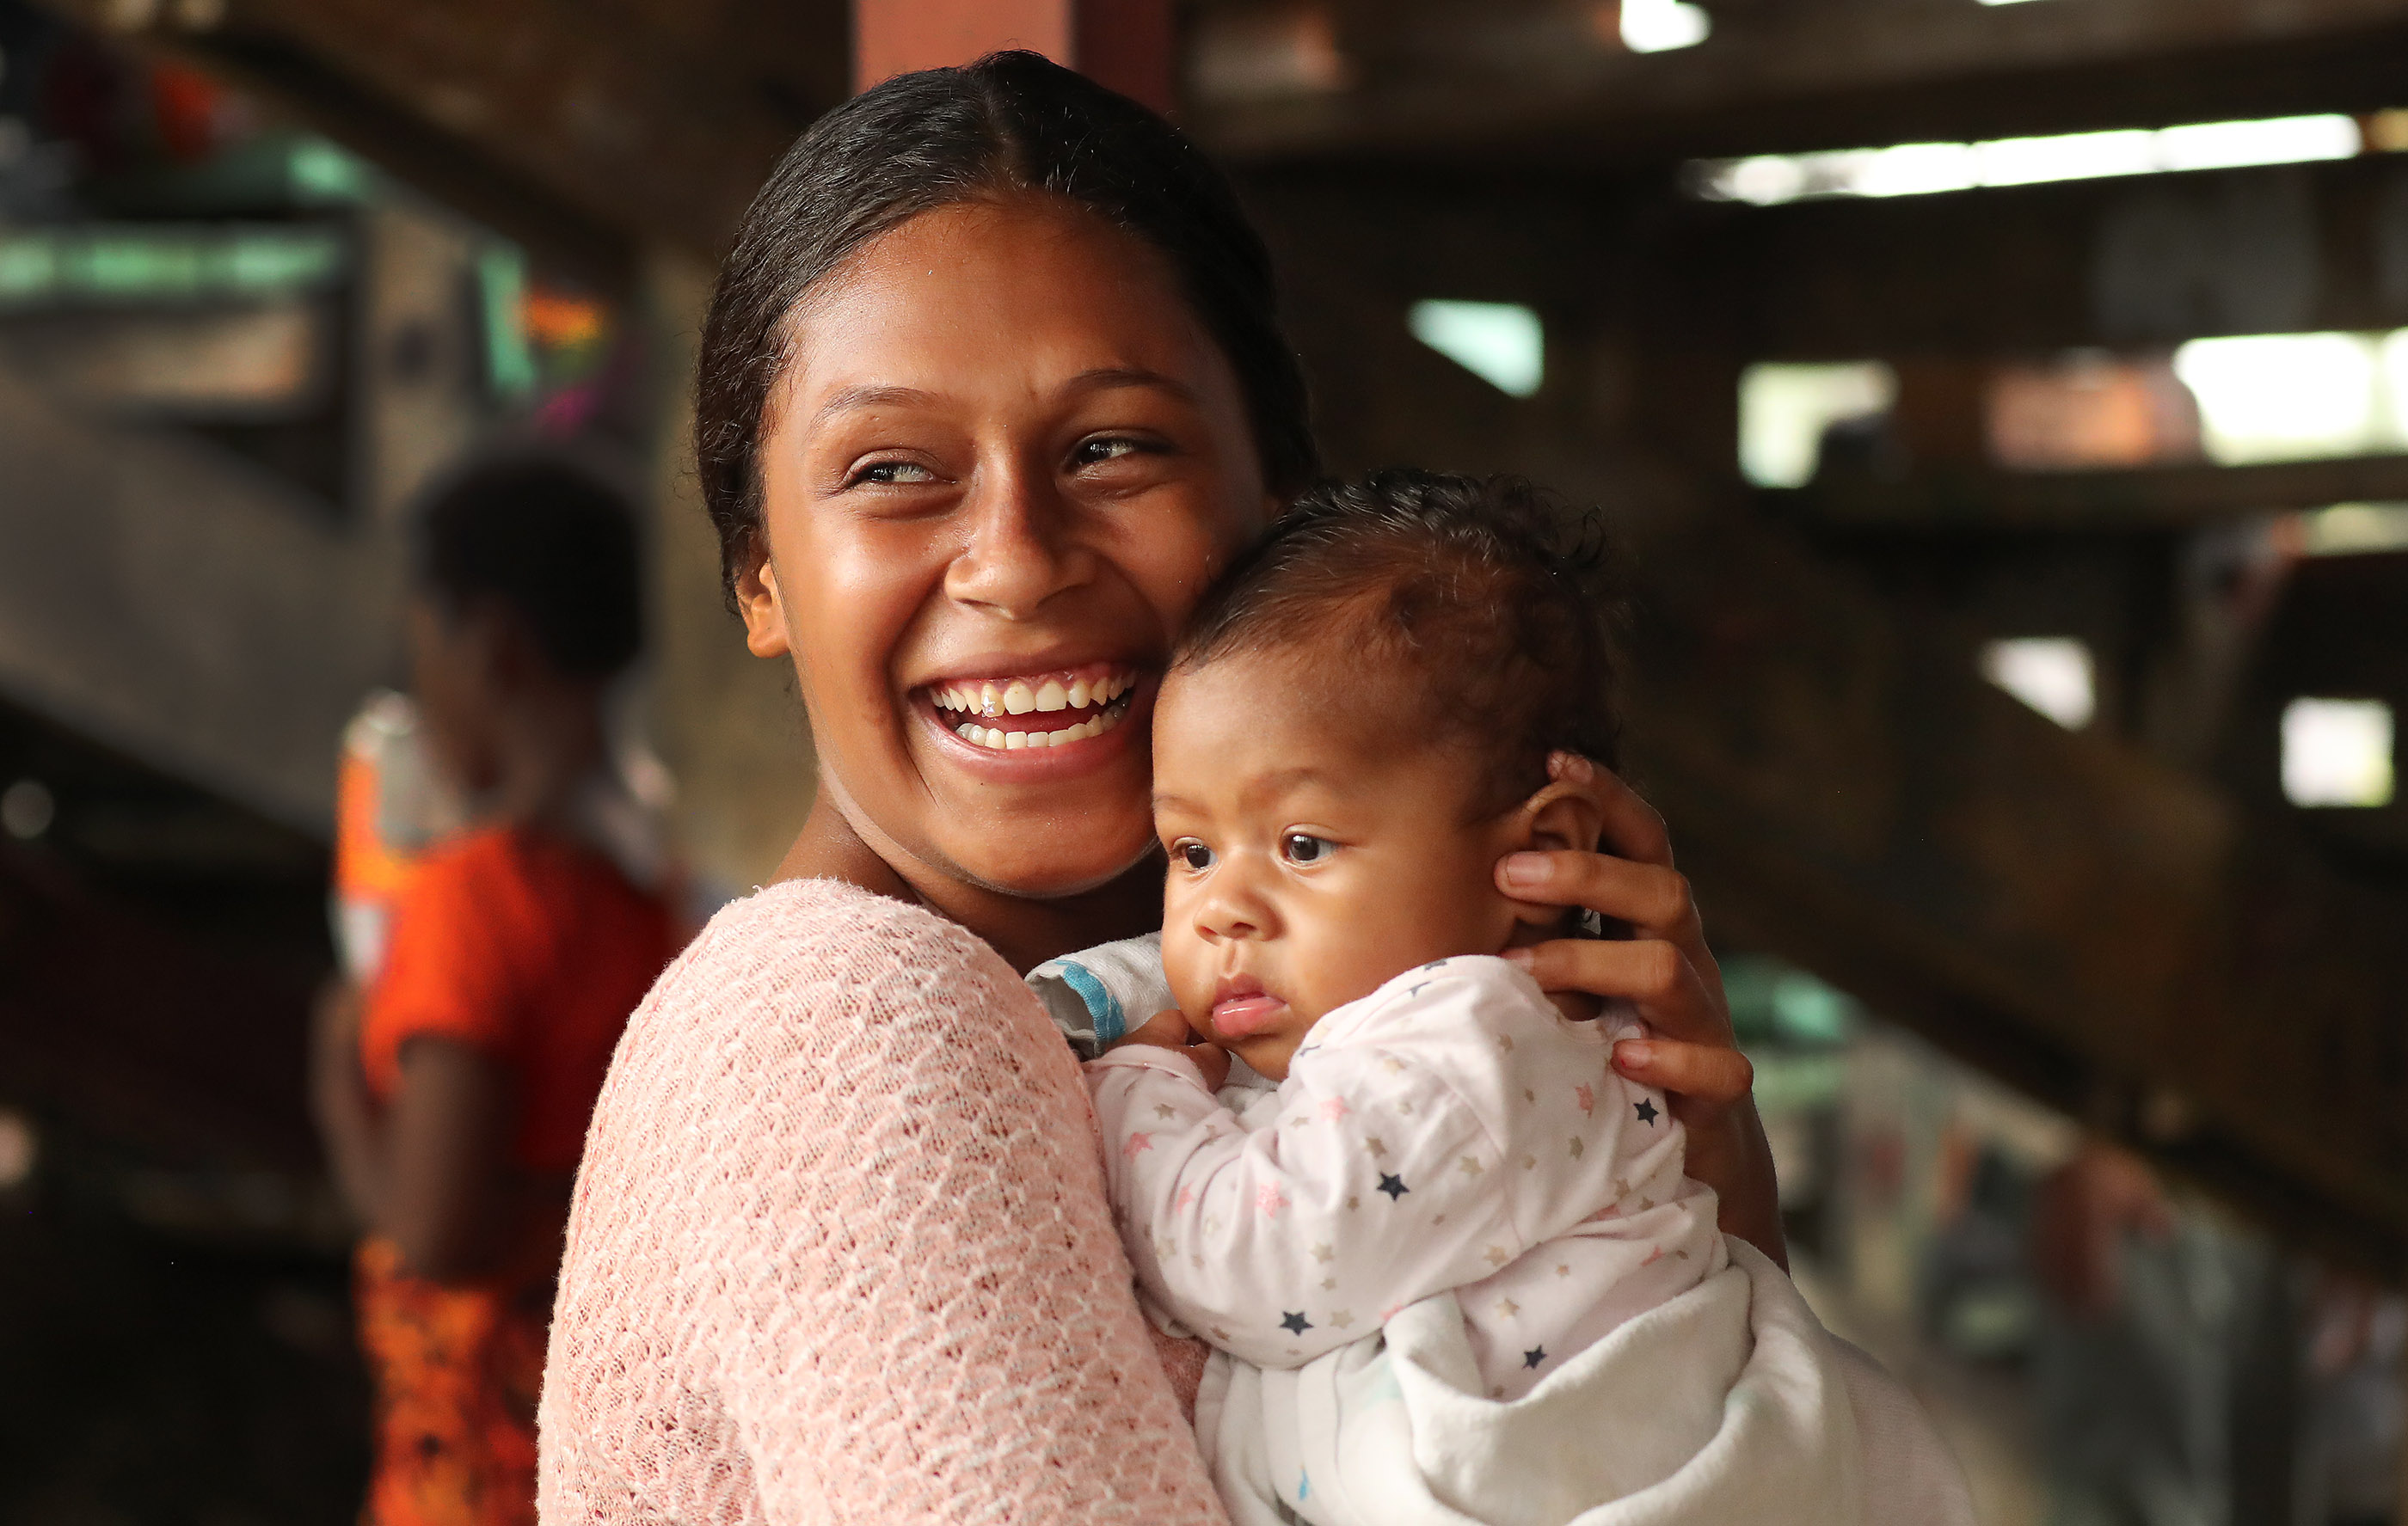 Varanisese Turua holds her daughter Etta Liahona Noa during a devotional at Ratu Cakobau stadium in Nausori, Fiji on May 22, 2019.